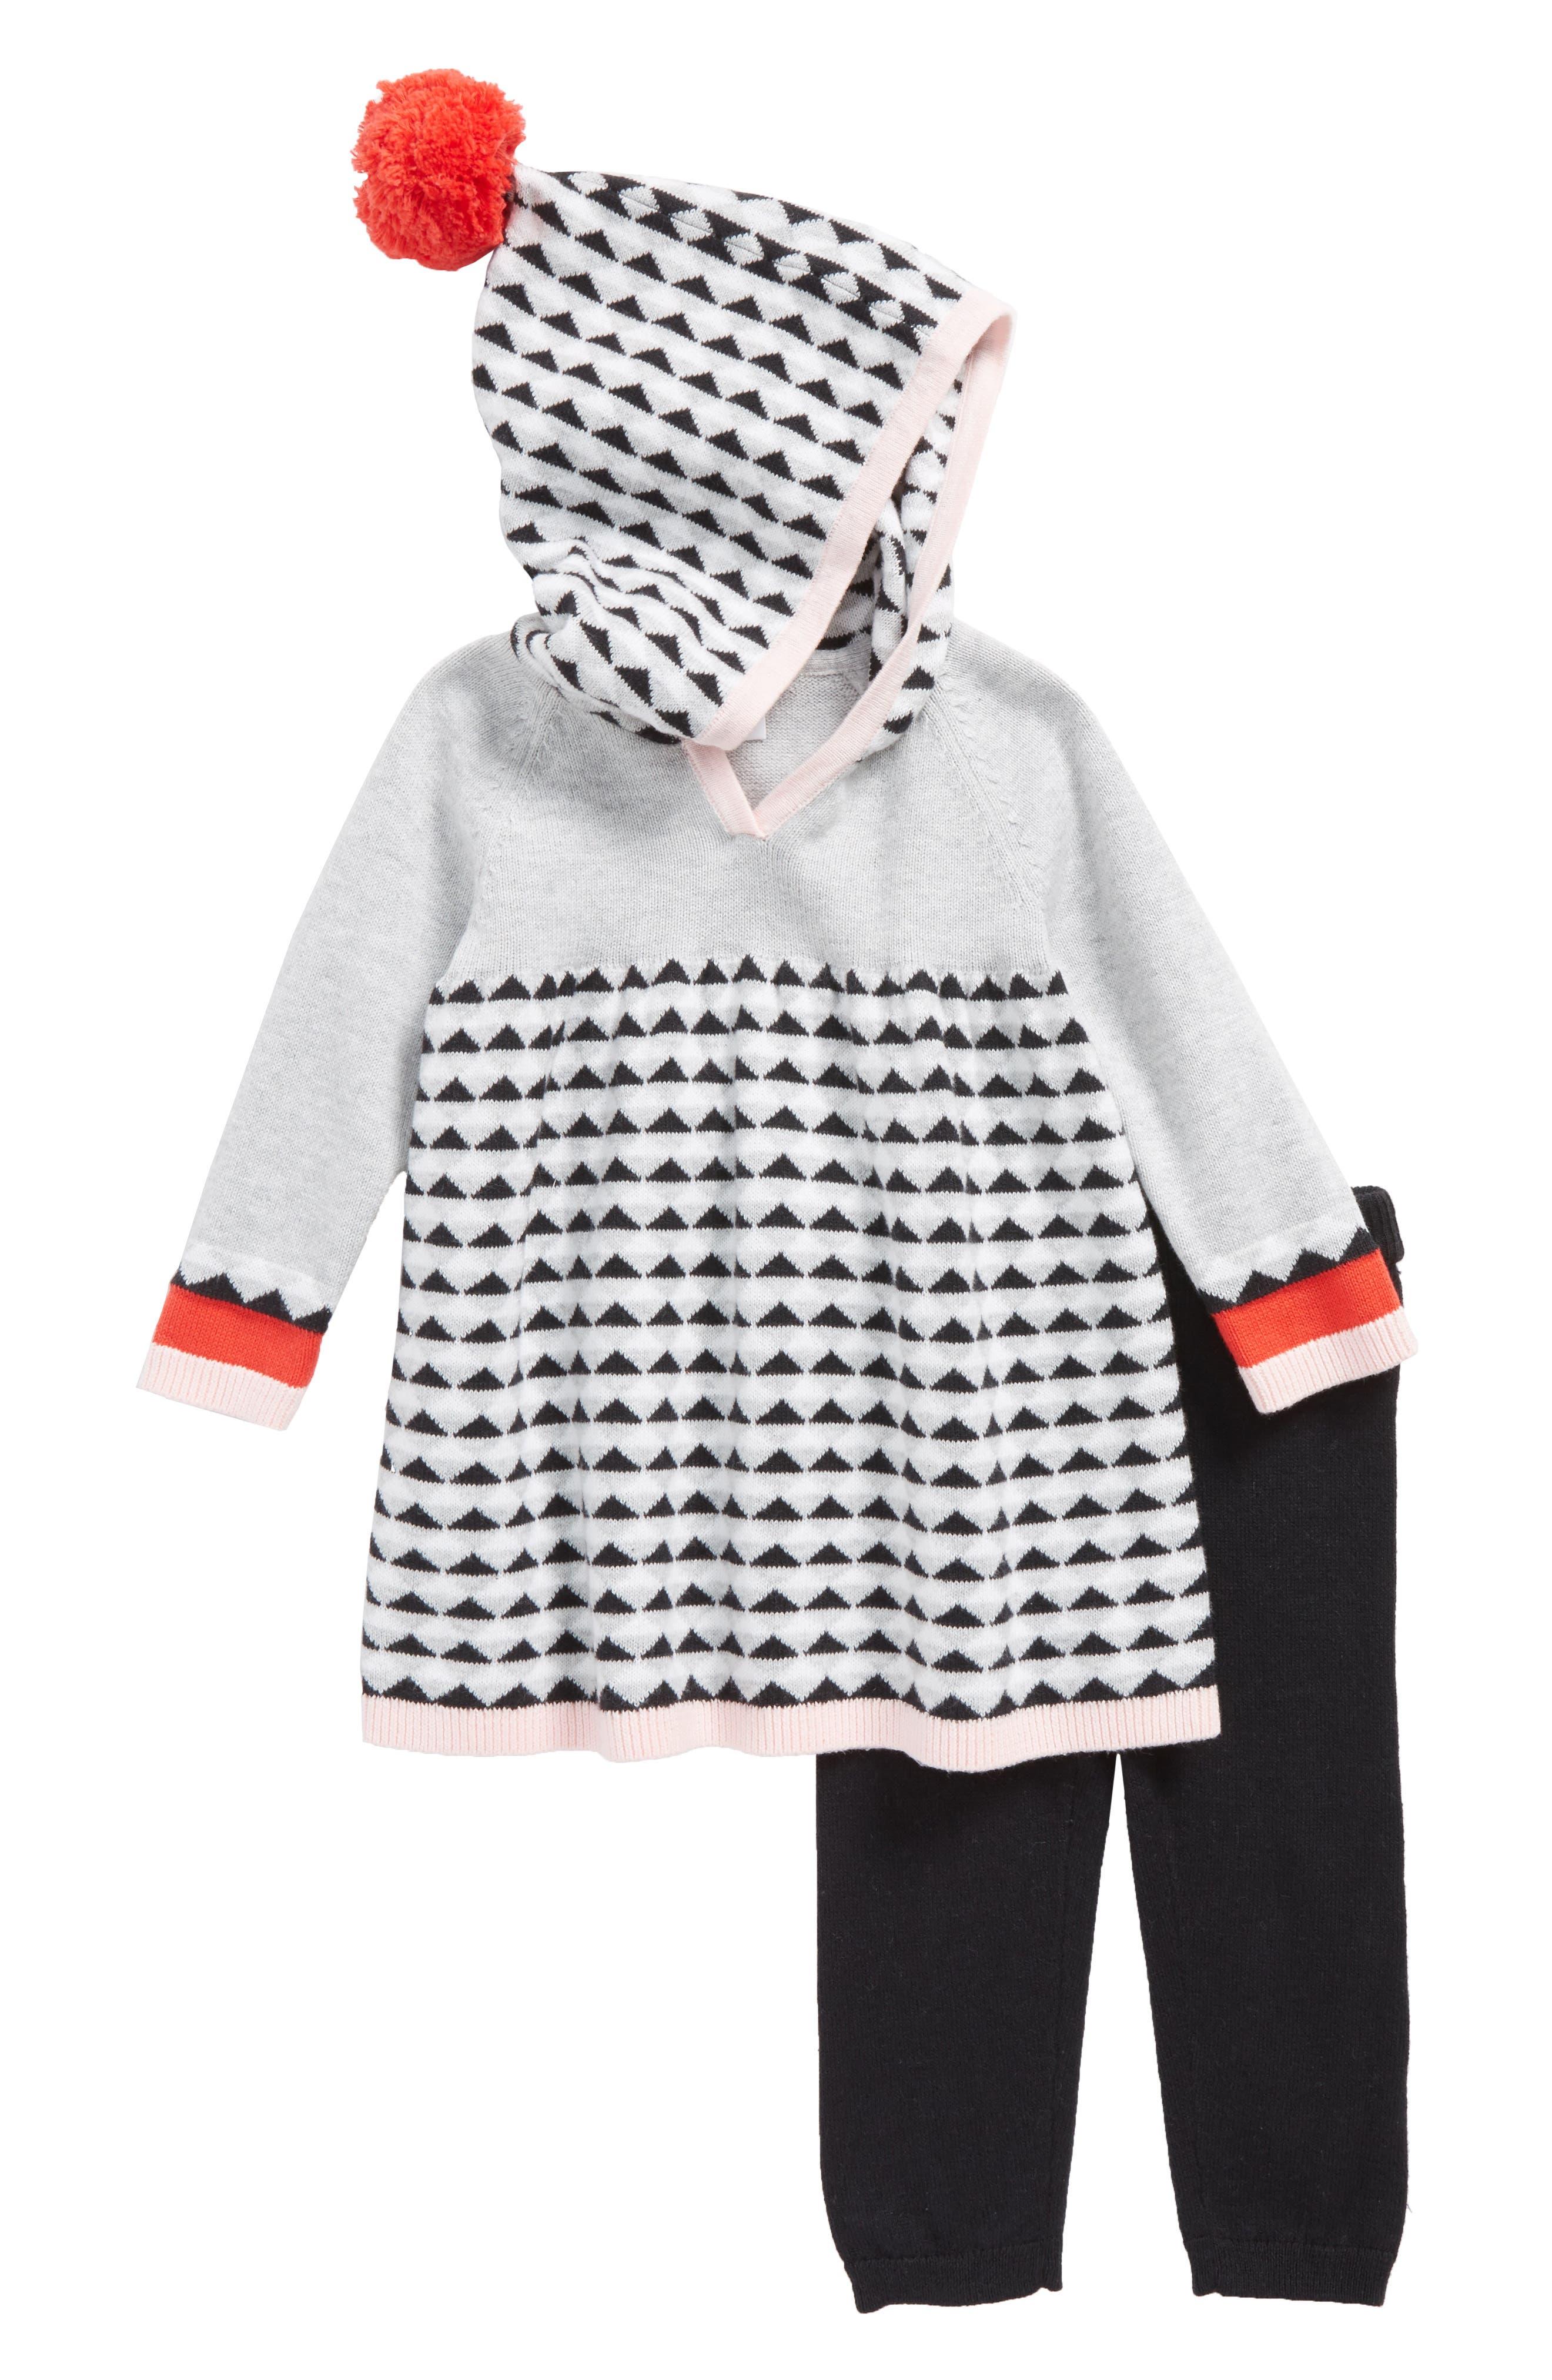 Hooded Sweater Dress & Leggings Set,                         Main,                         color, Grey Ash Heather Geo